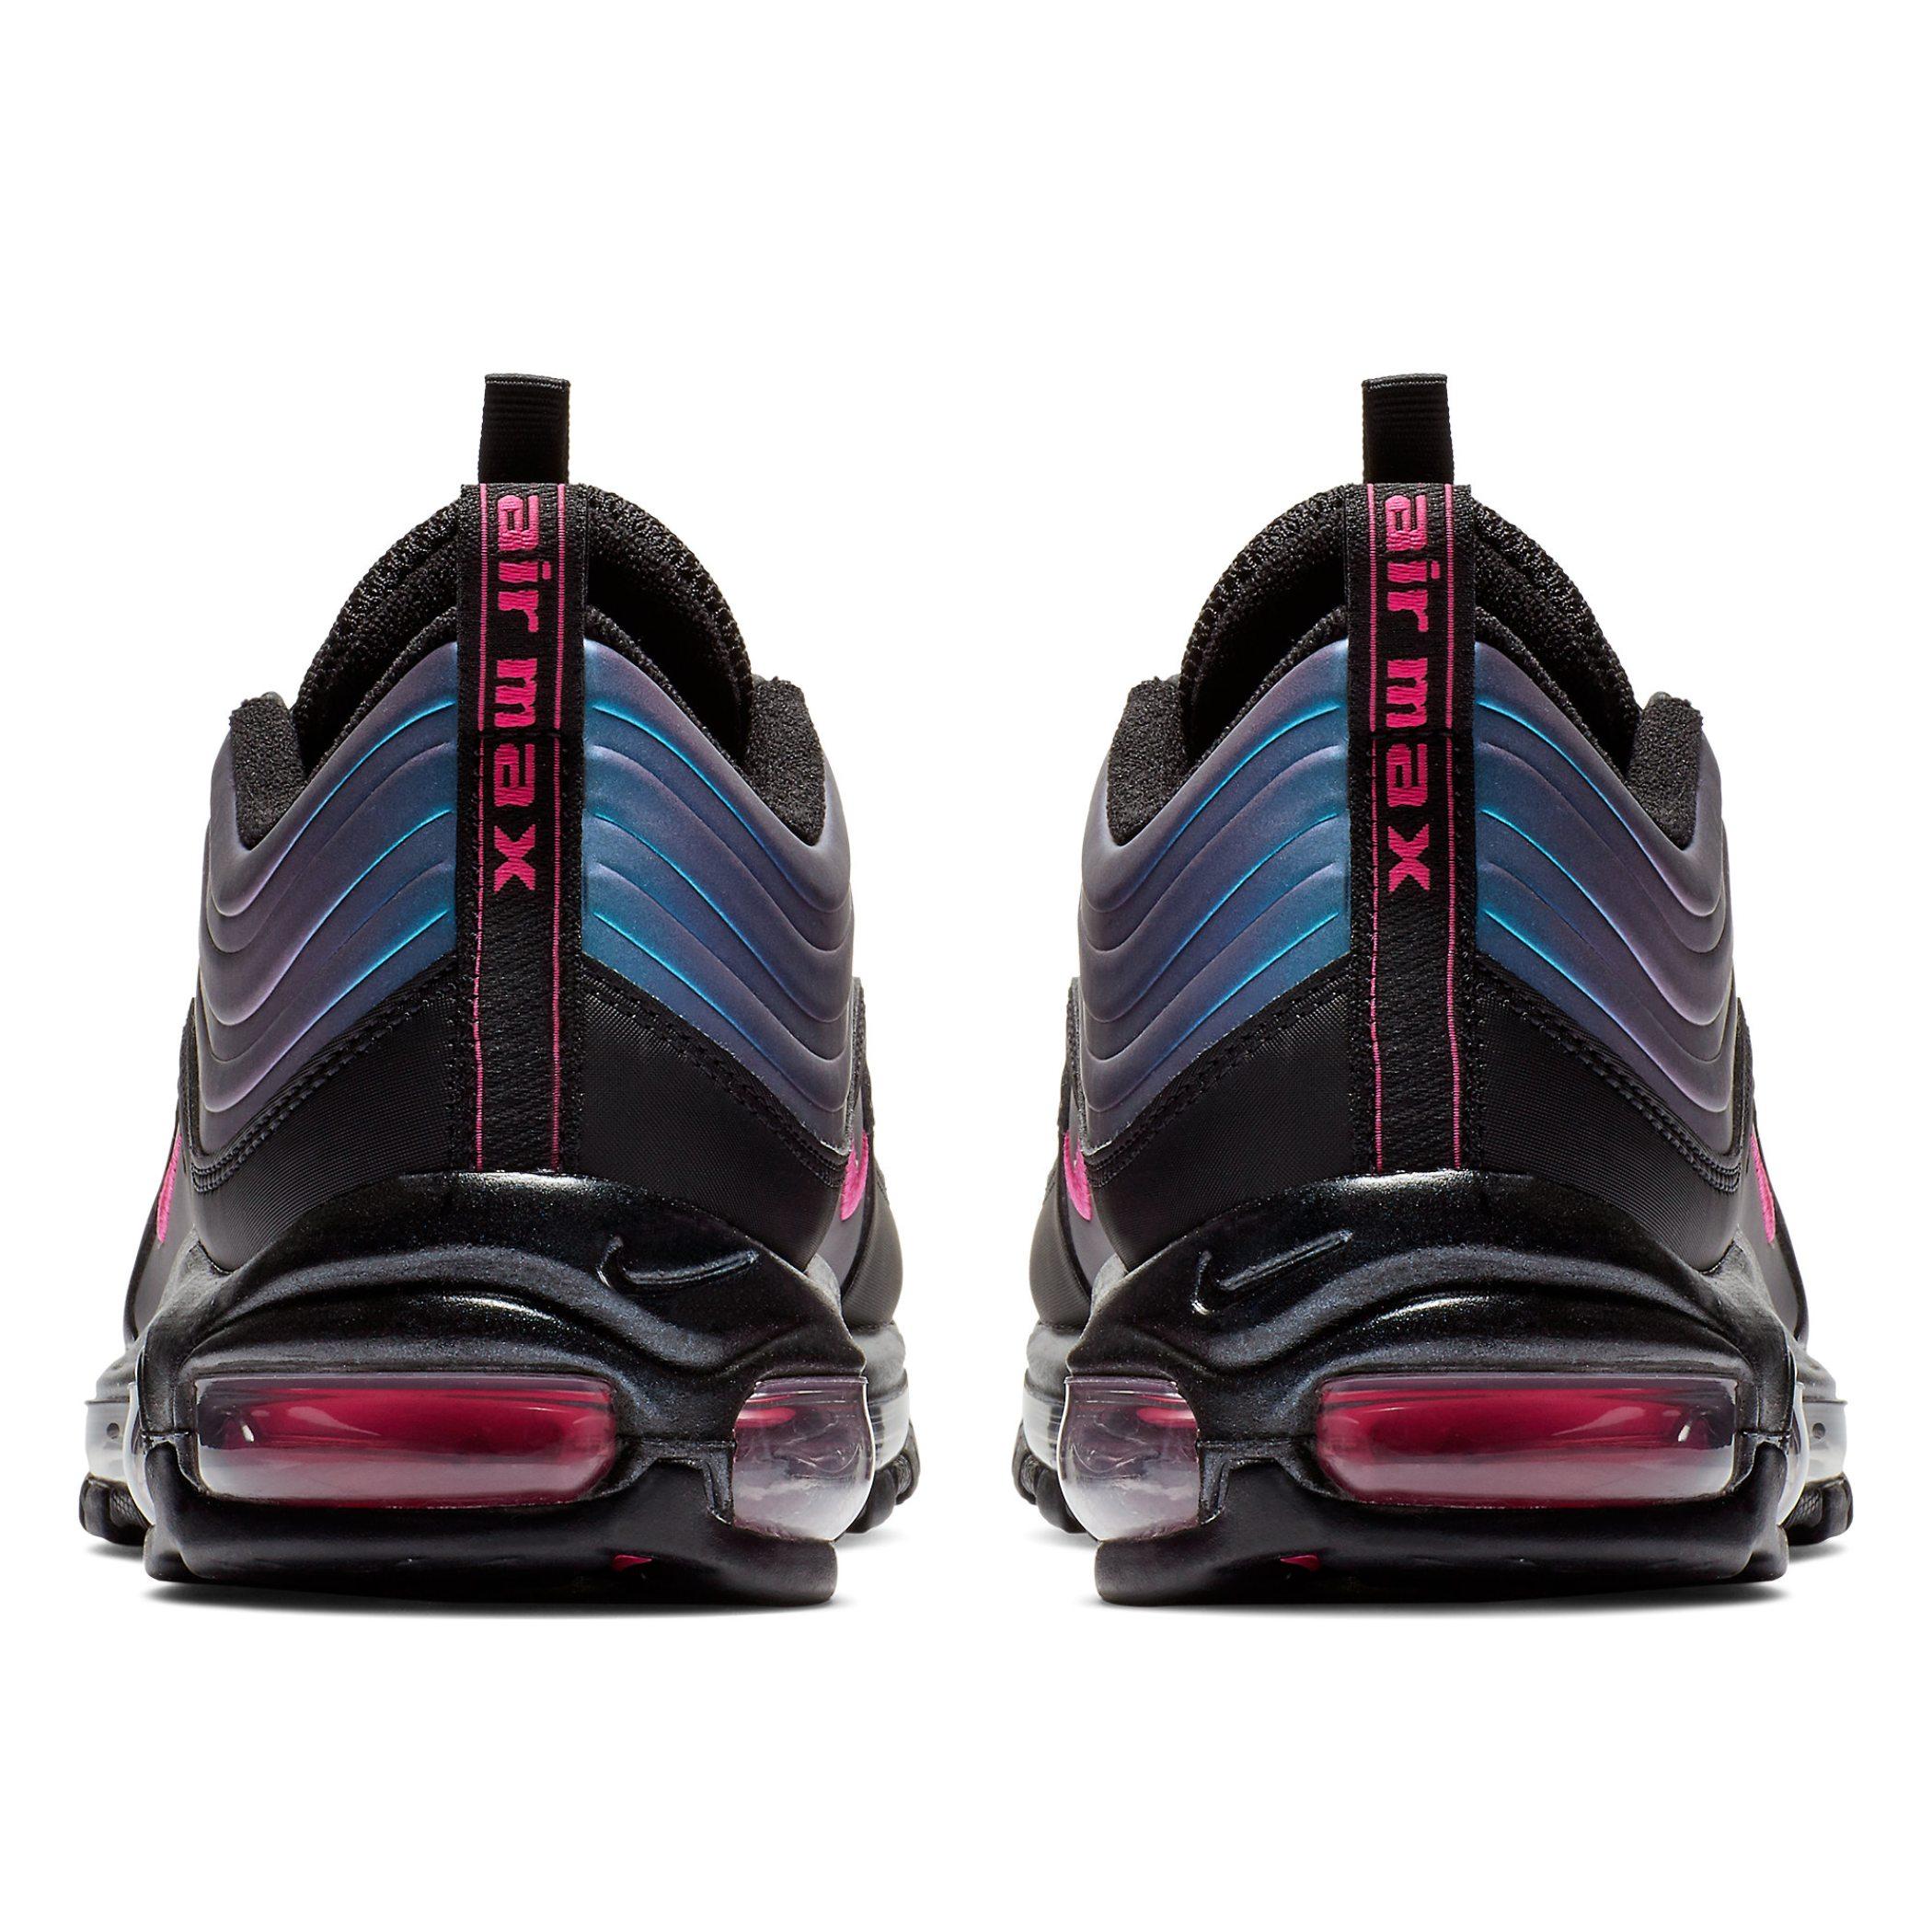 0f1e7063 Мужские кроссовки Nike Air Max 97 Lux Black/Laser Fuchsia-Thunder Grey -  фото